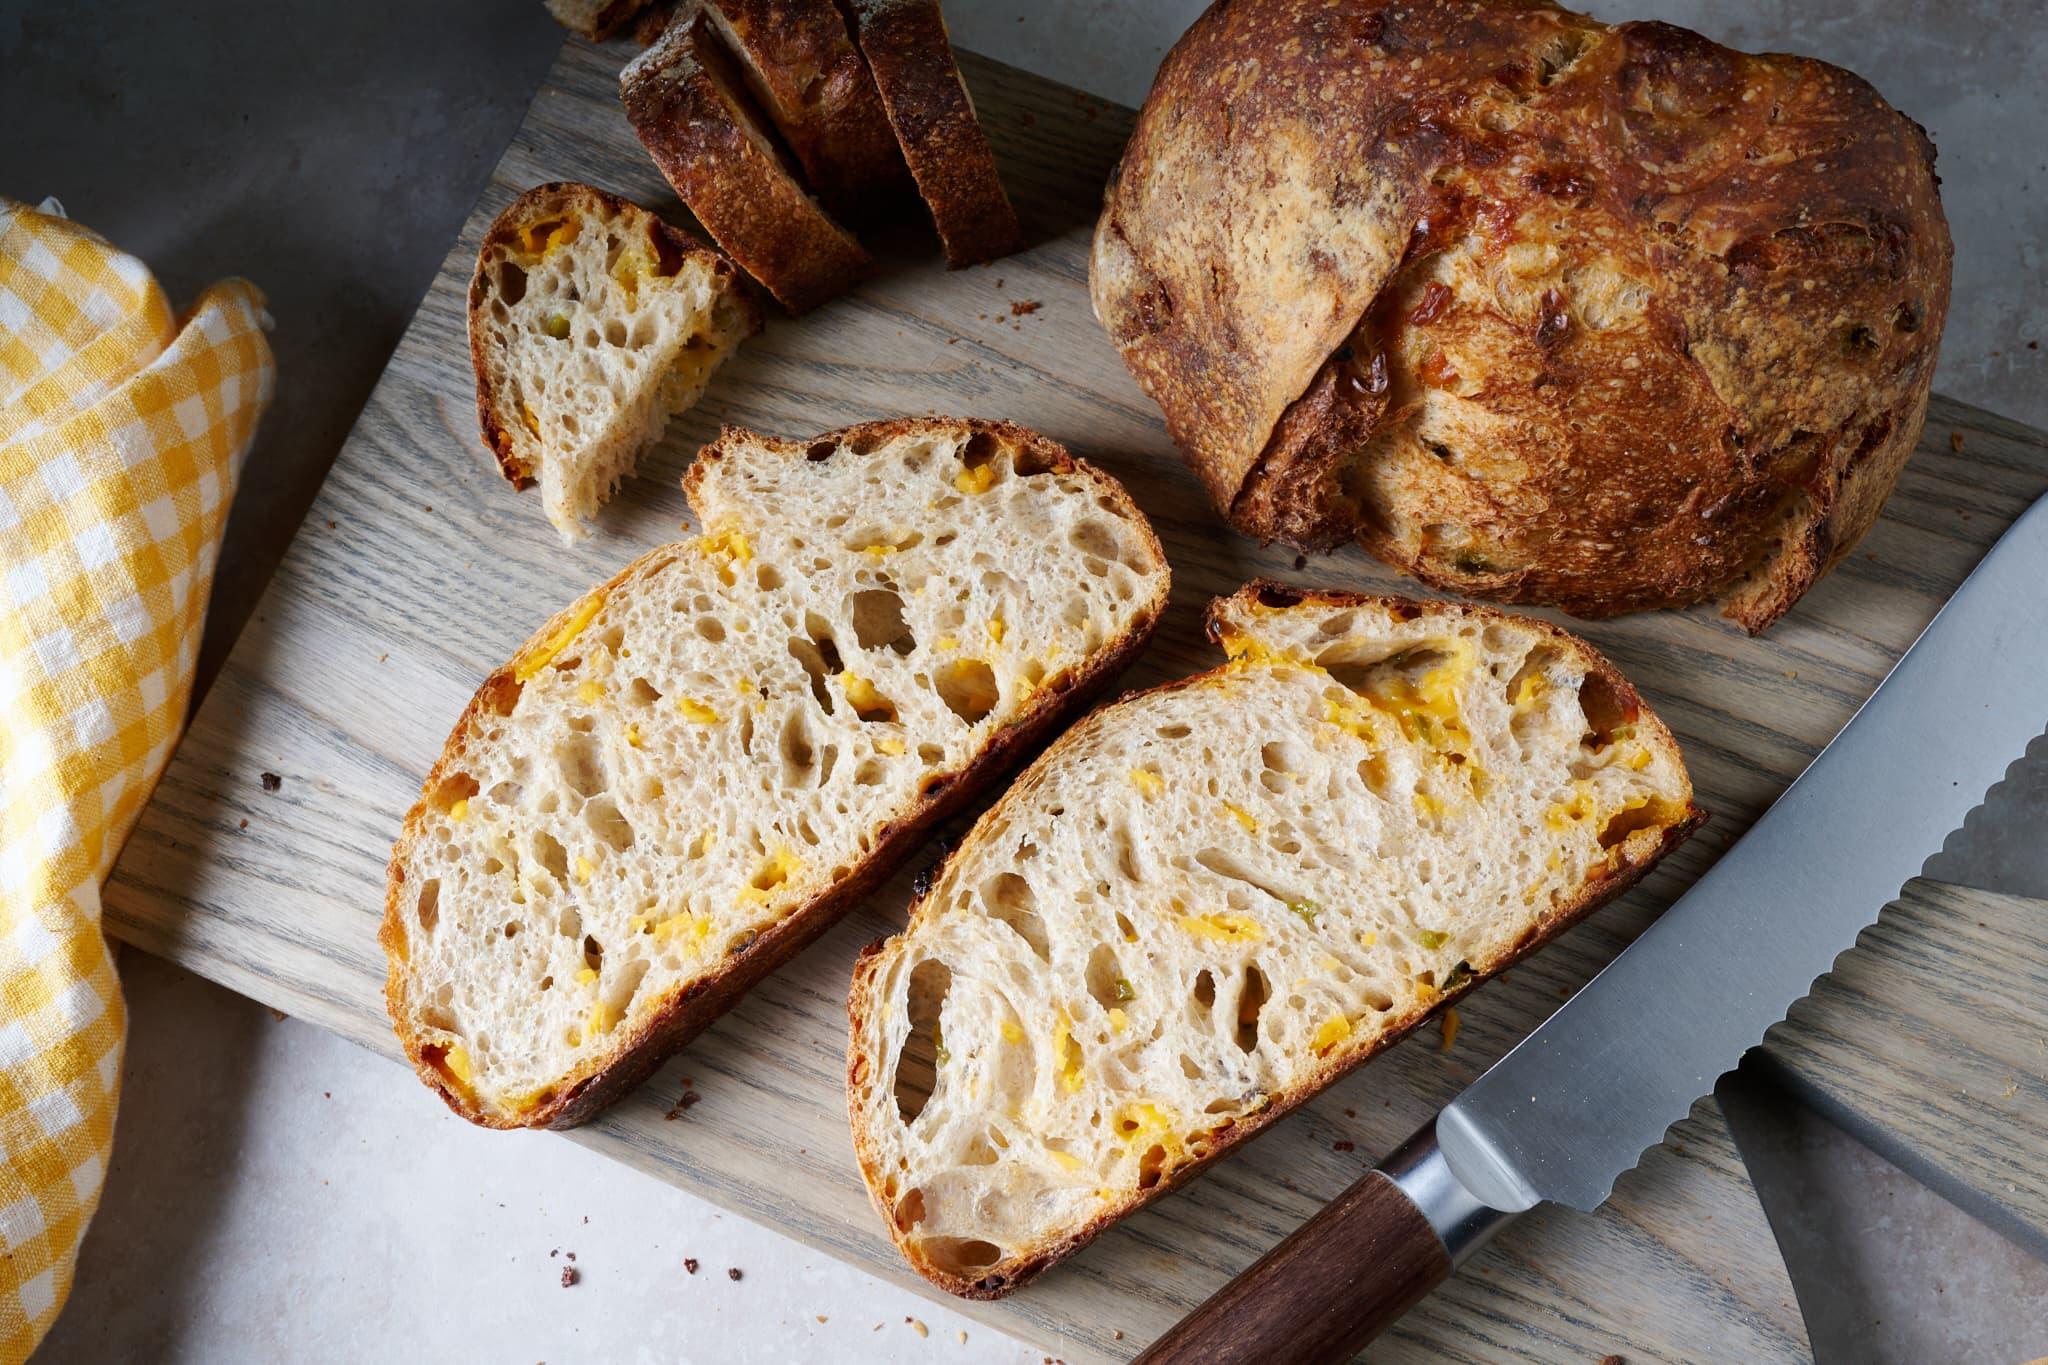 Jalapeño-cheddar sourdough bread crumb